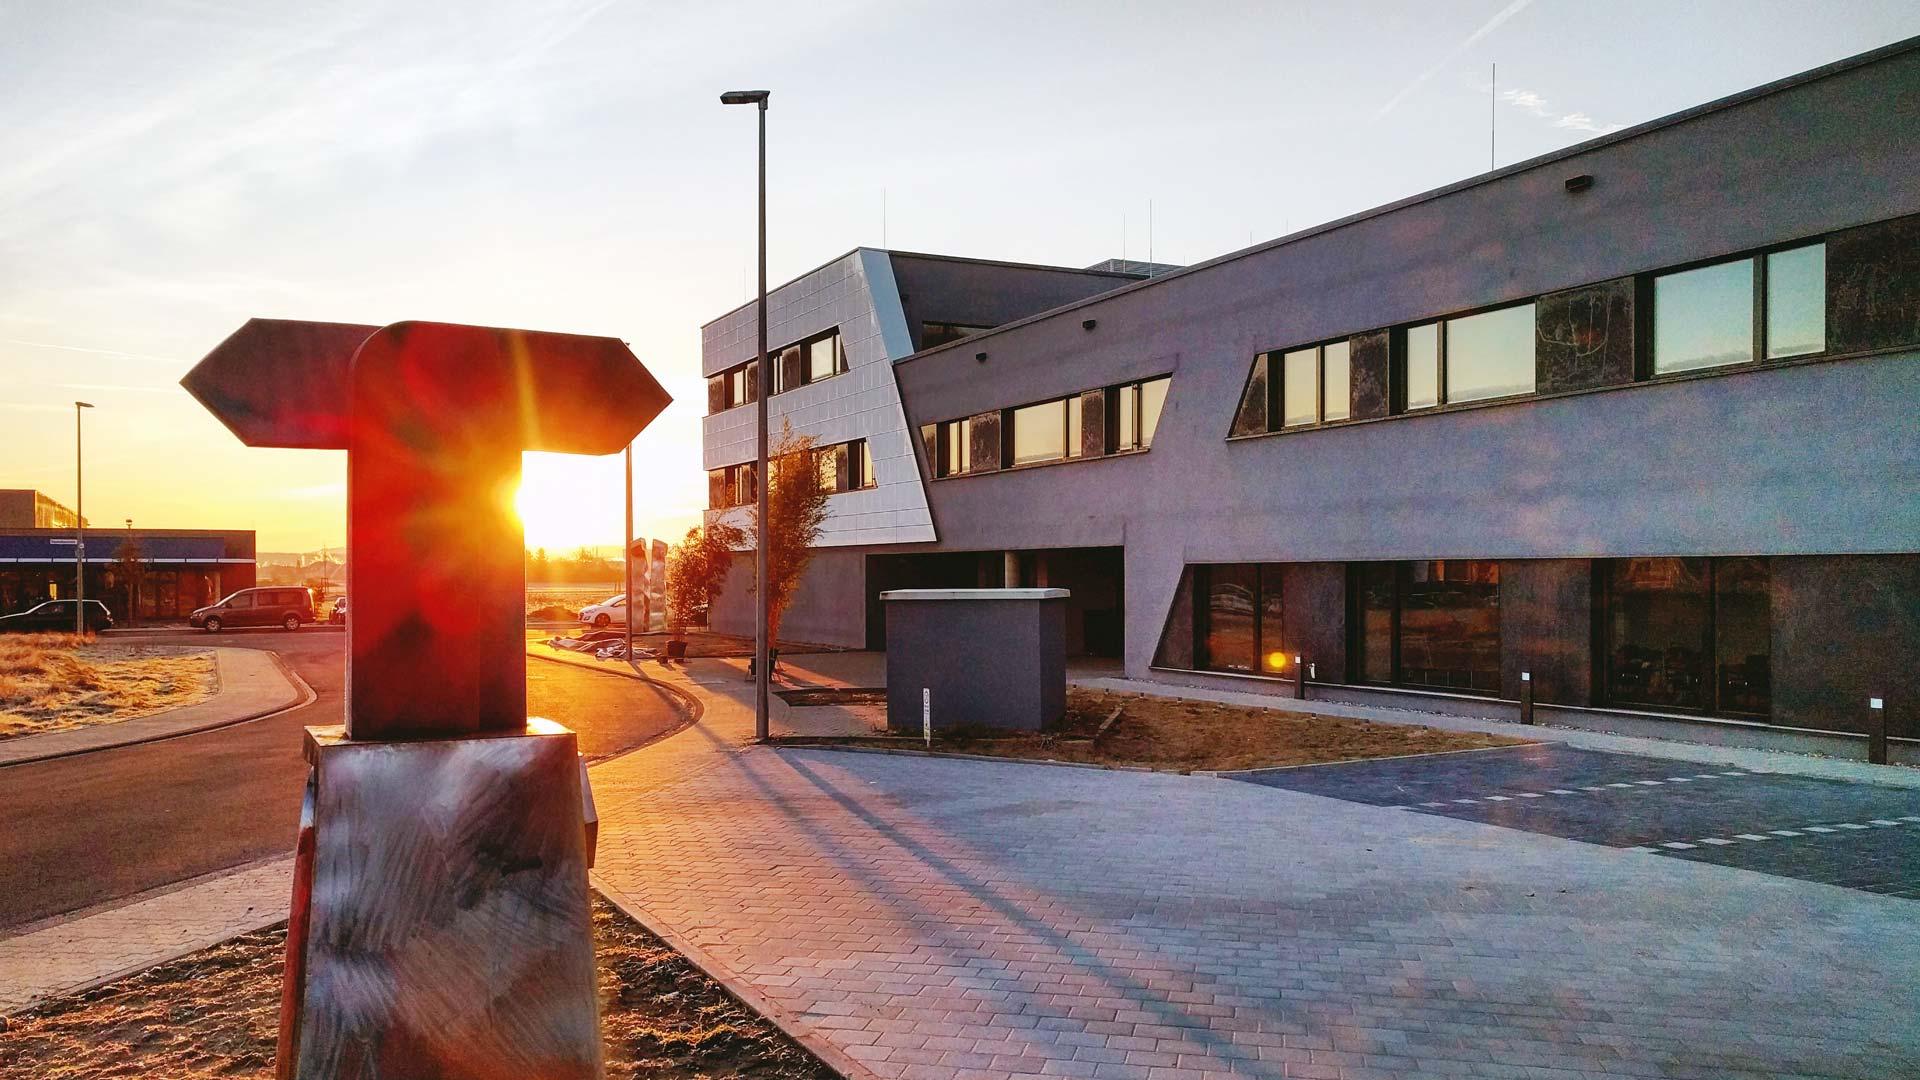 TUP-Campus Dr. Thomas + Partner GmbH & Co. KG